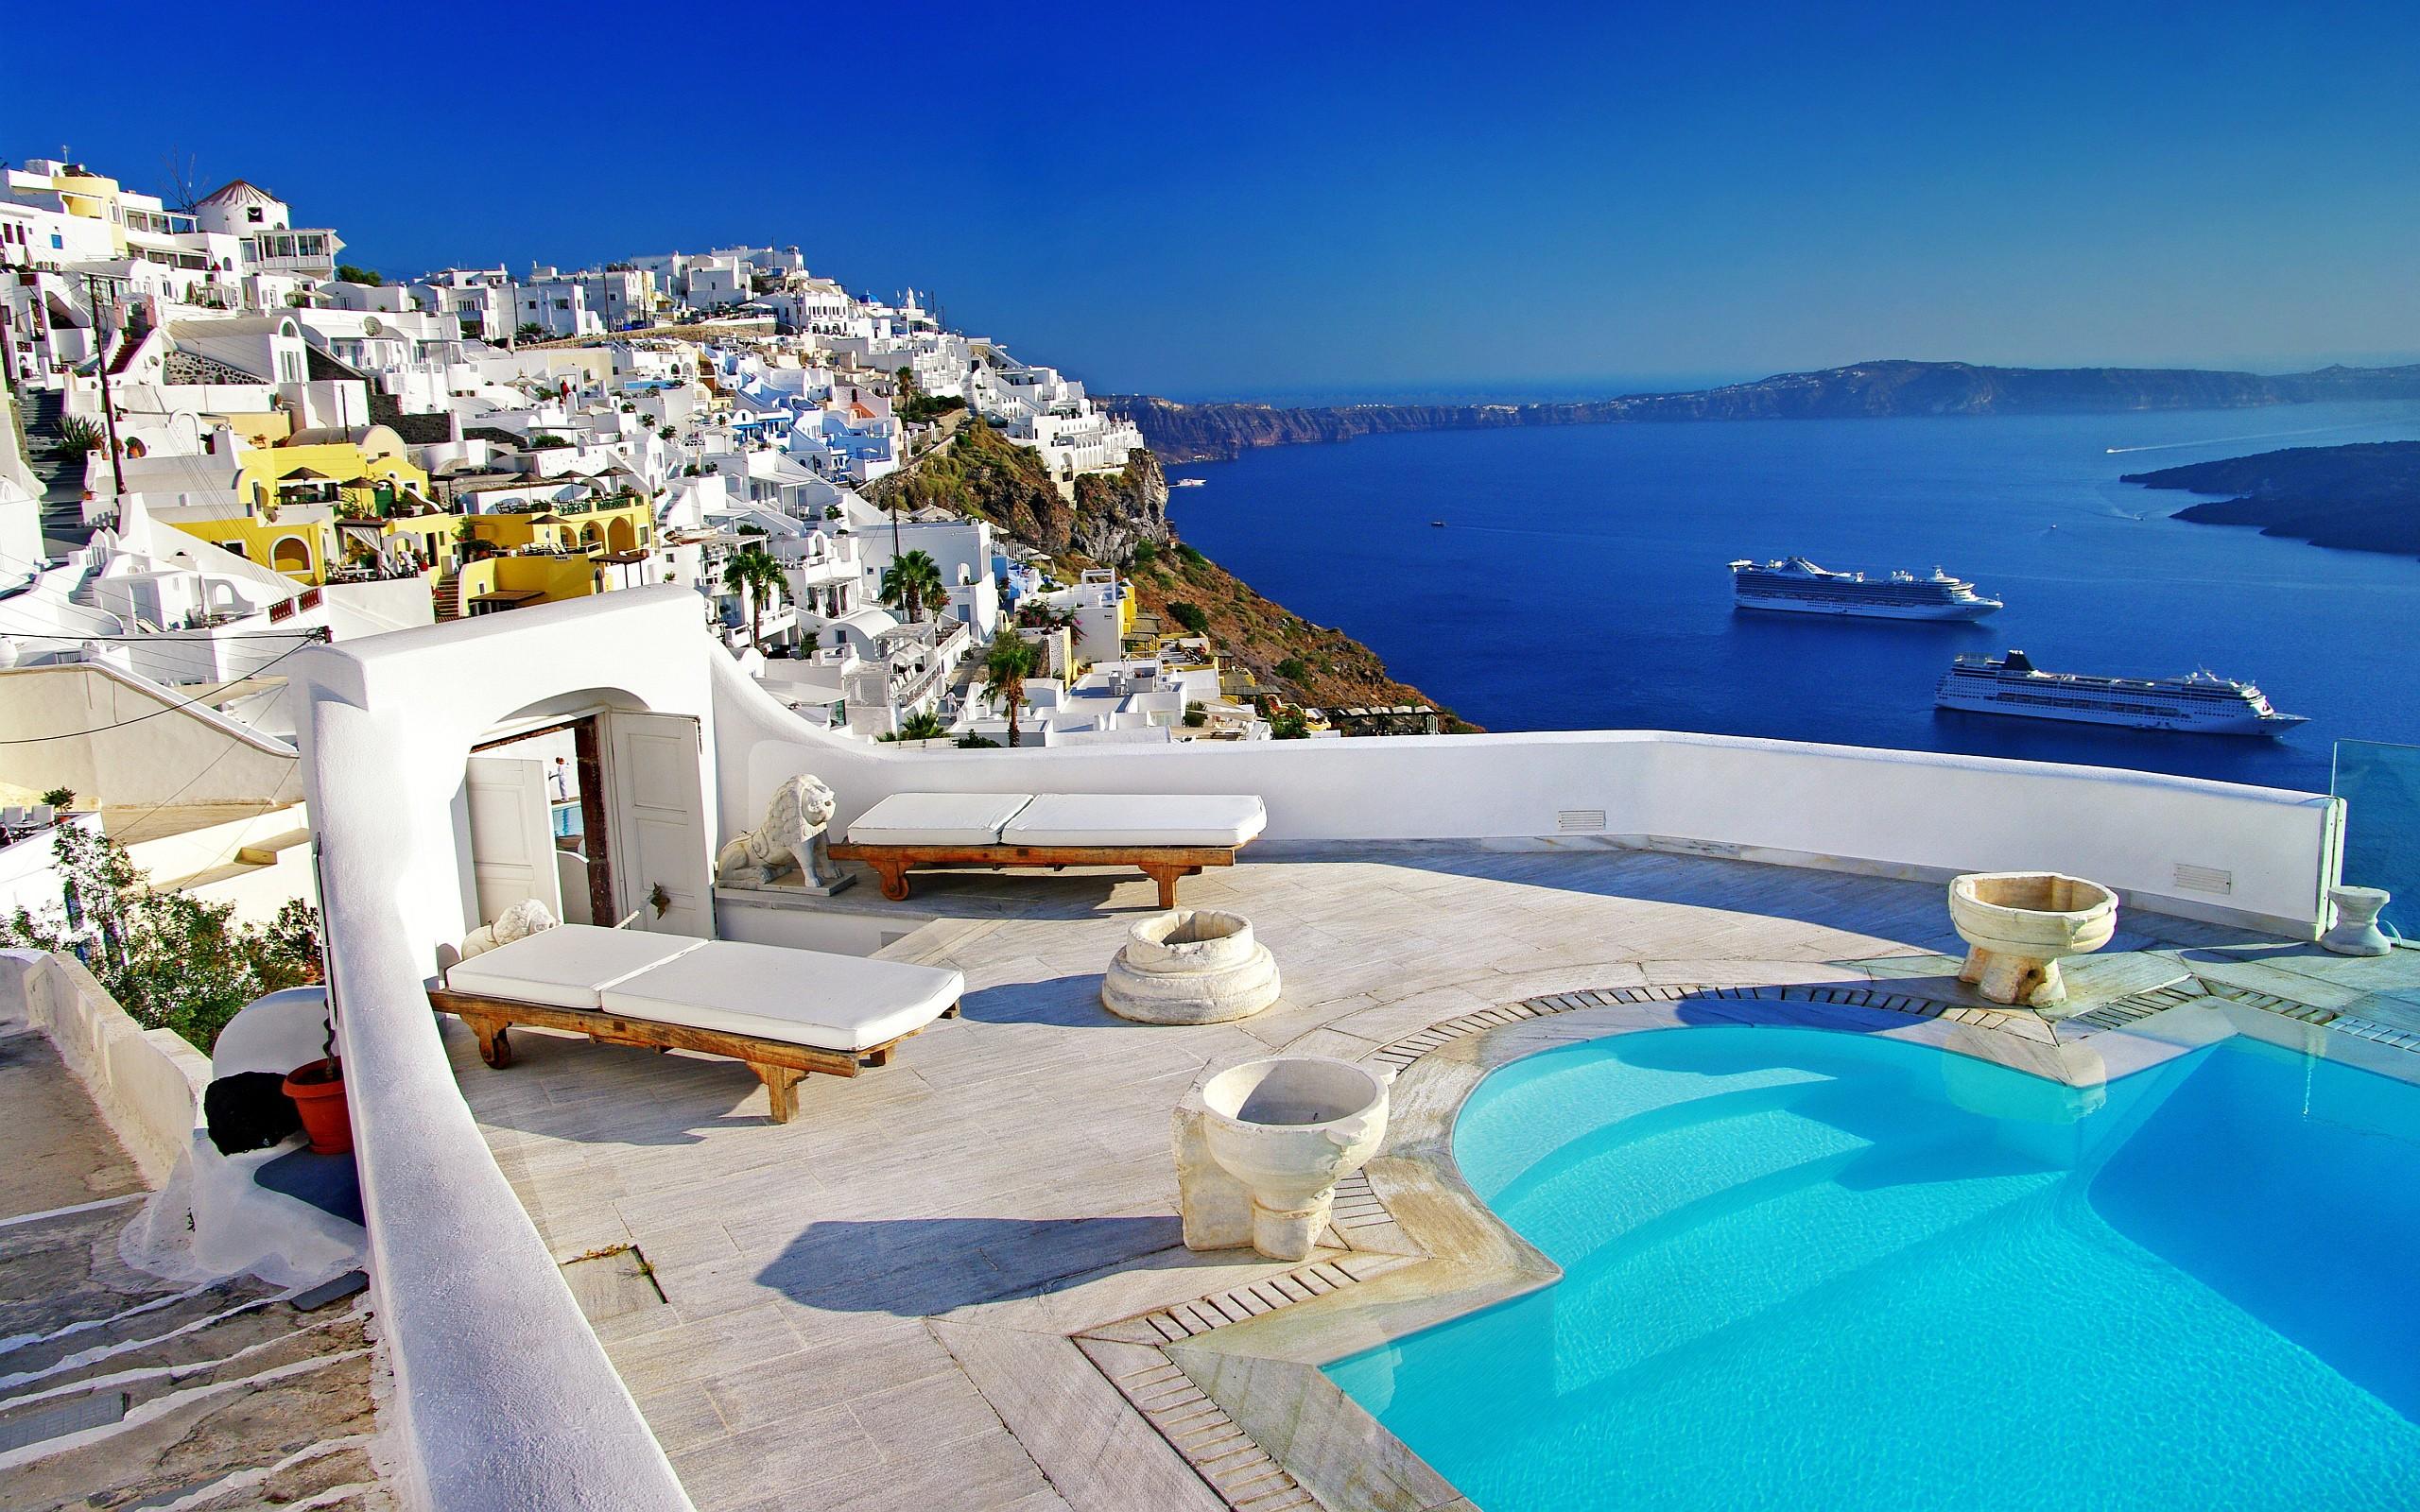 General 2560x1600 house cruise ship river Greece mykonos island Santorini sunlight ship